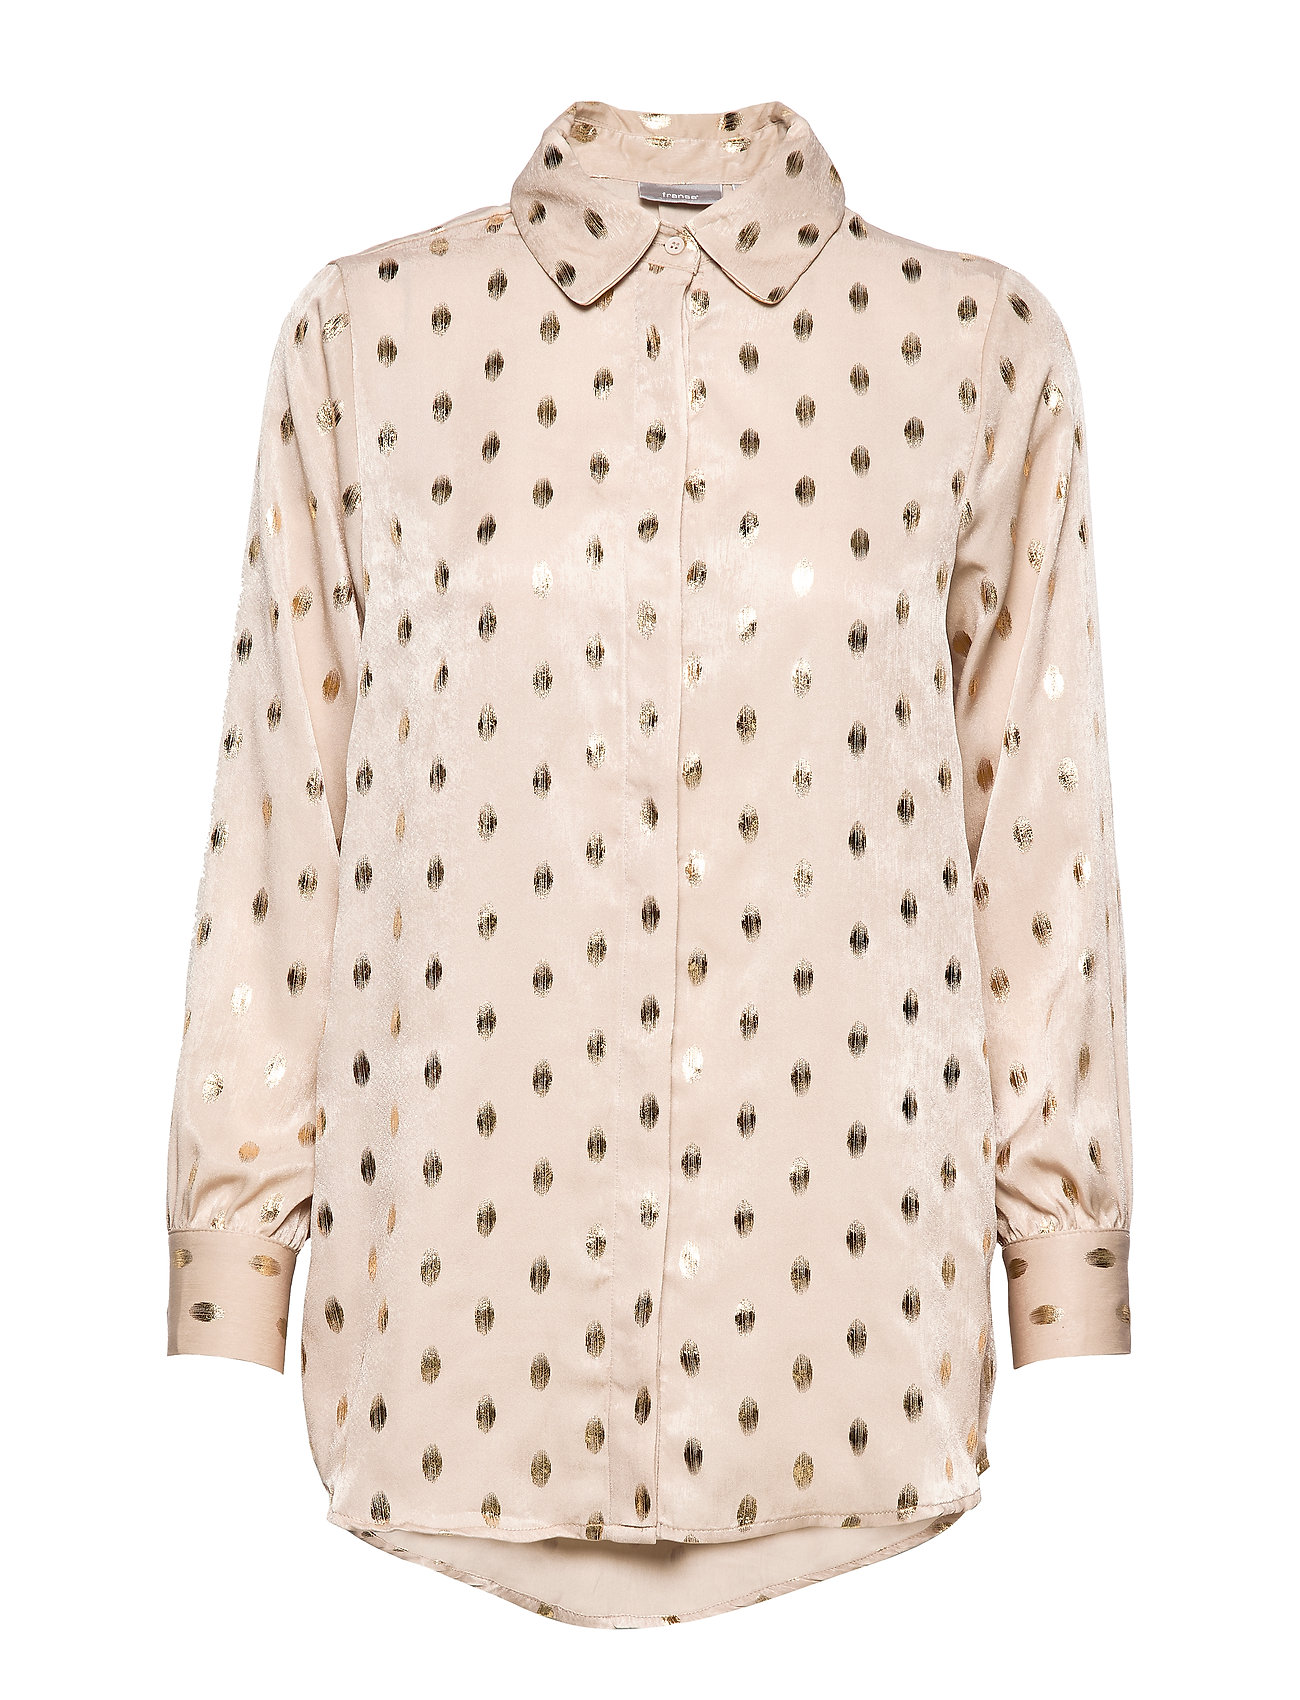 Fransa FRGAFOIL 1 Shirt - FROSTED ALMOND MIX